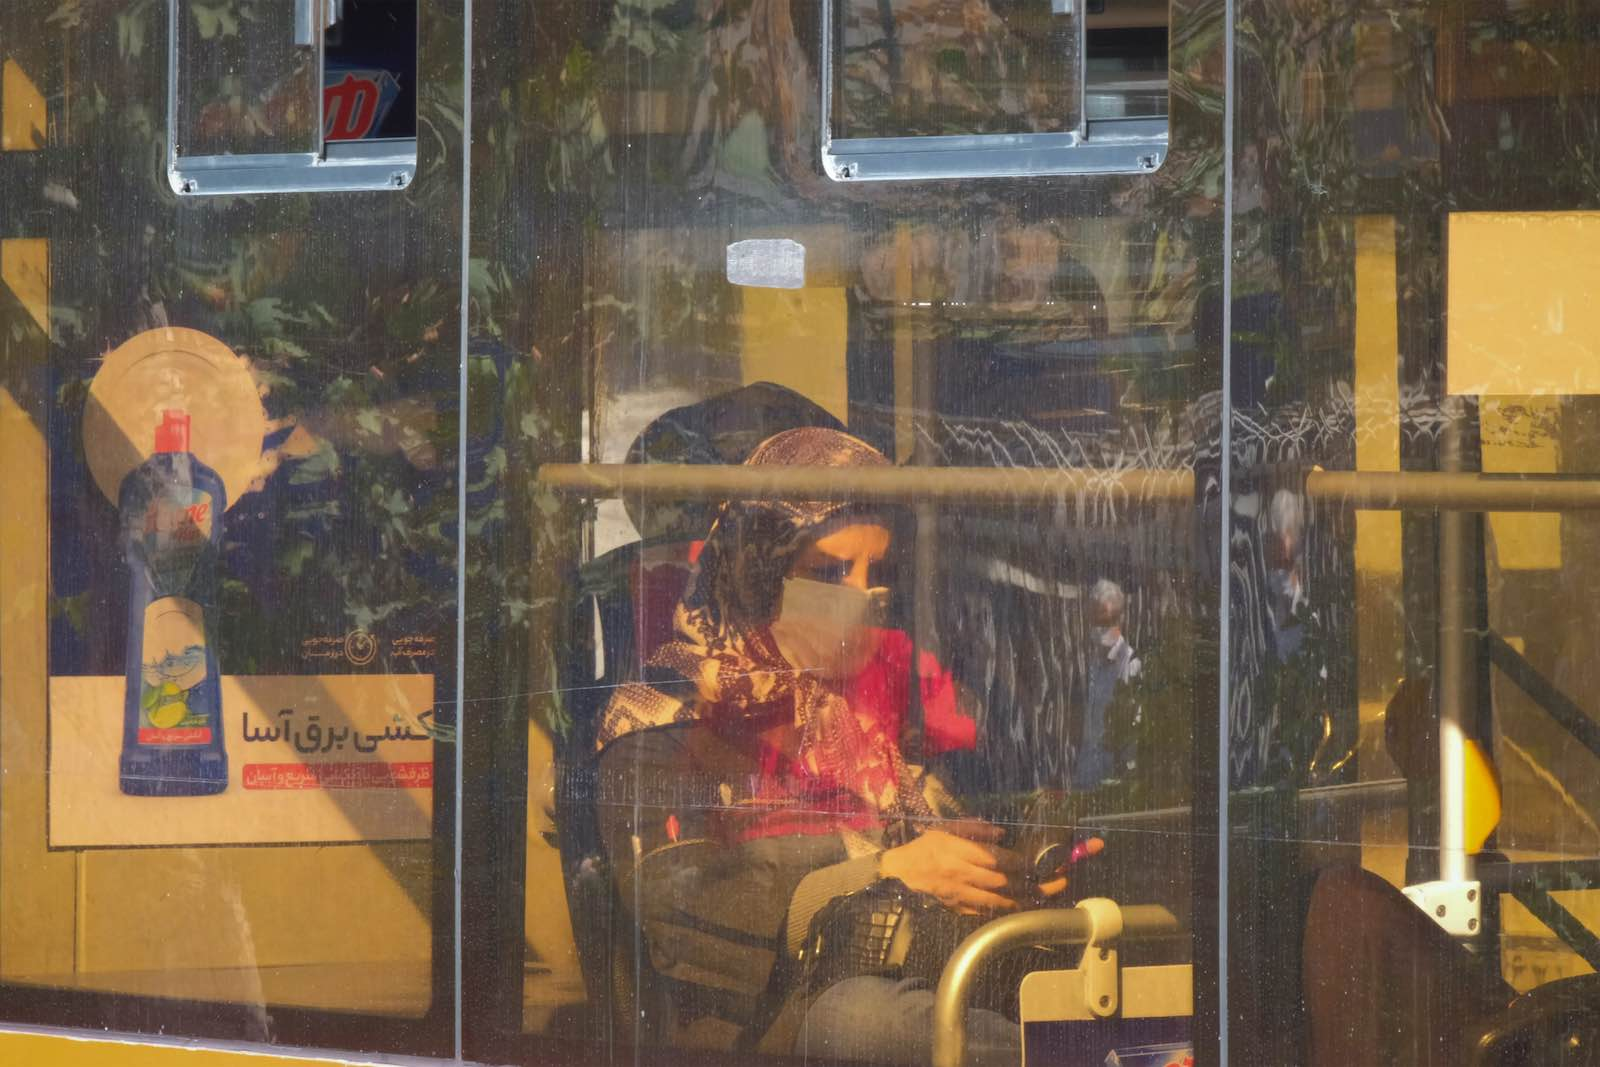 A woman on a bus in Tehran, October 2020 (Morteza Nikoubazl/NurPhoto via Getty Images)